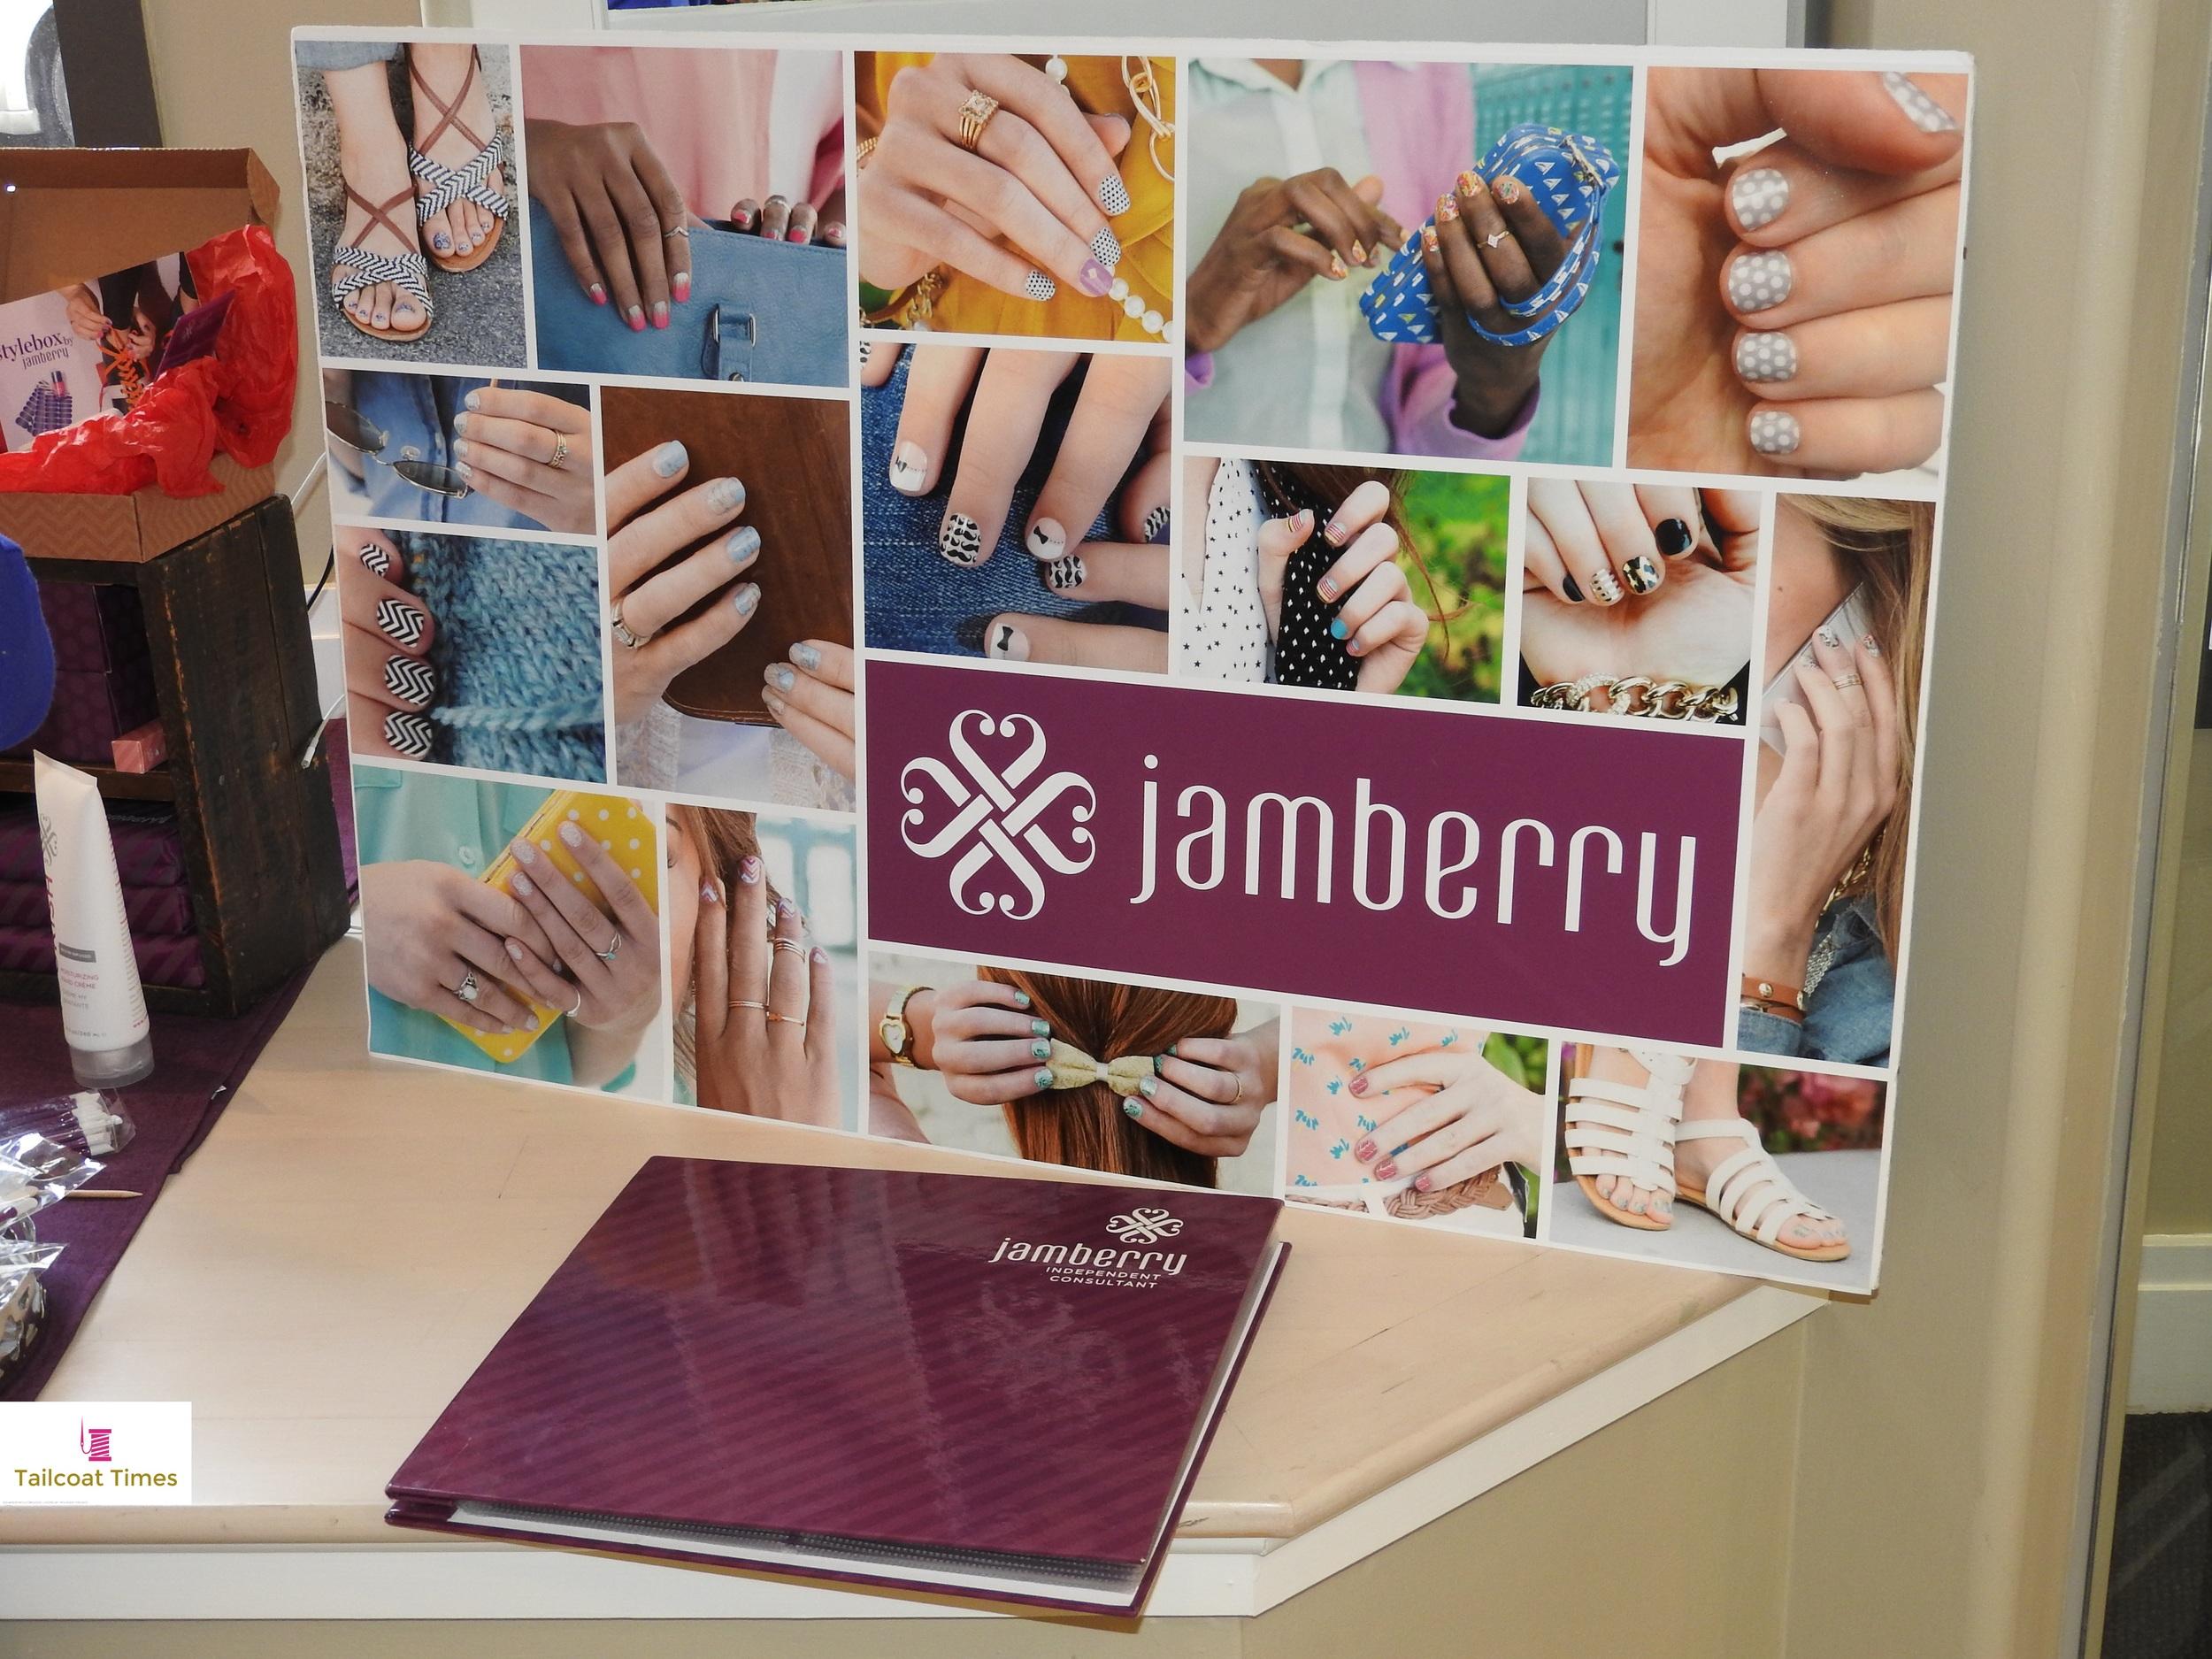 BCFWeek 2015 - Talbots - Jamberry 2.JPG